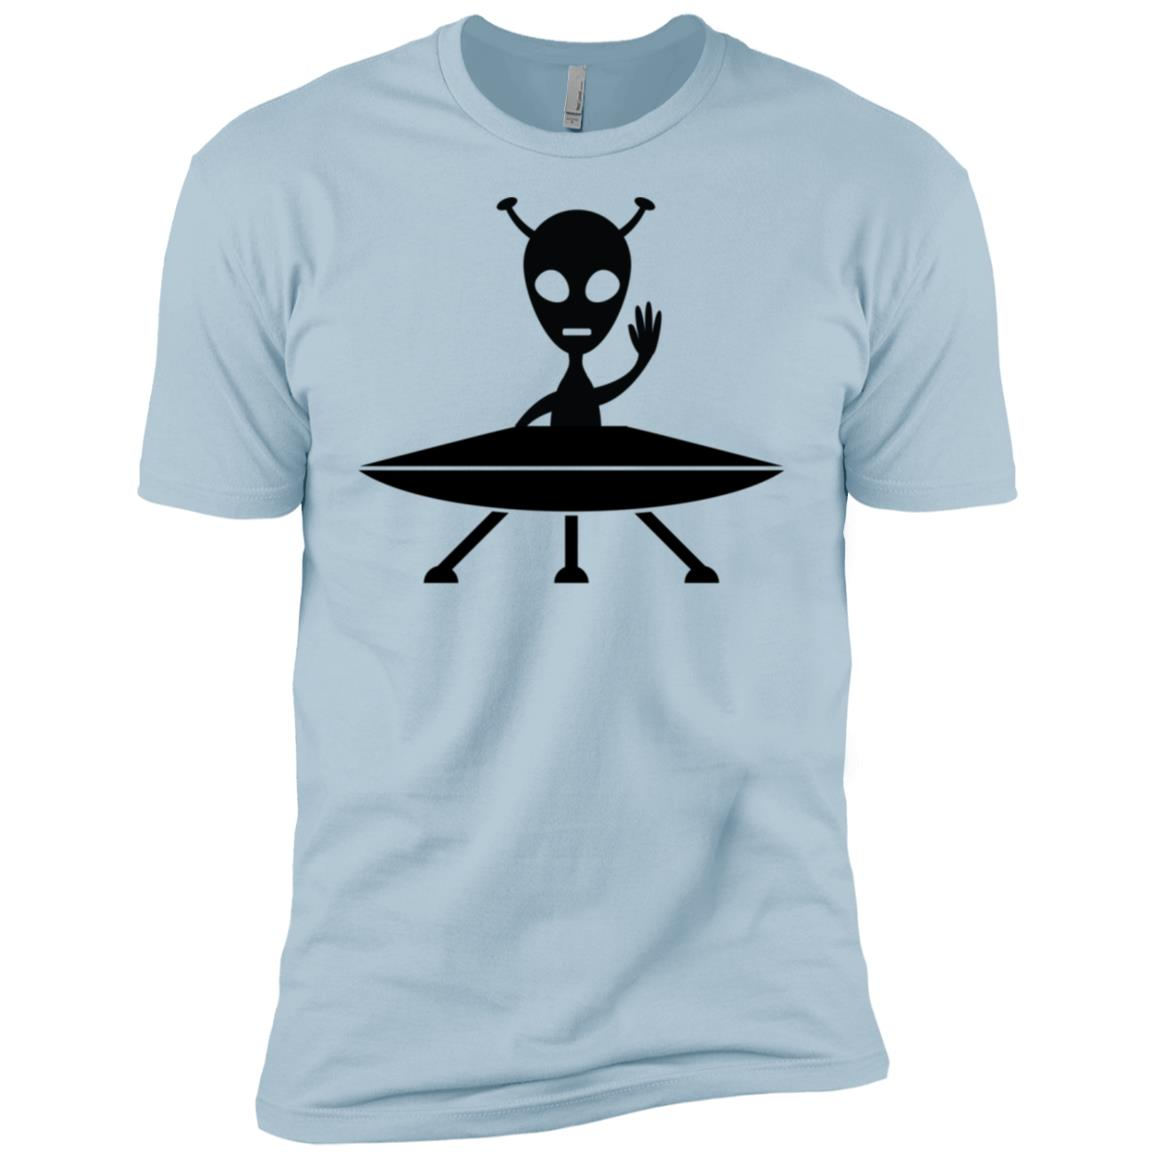 Funny Allien On A Spaceship Ufo Birthday Gift -1 Men Short Sleeve T-Shirt